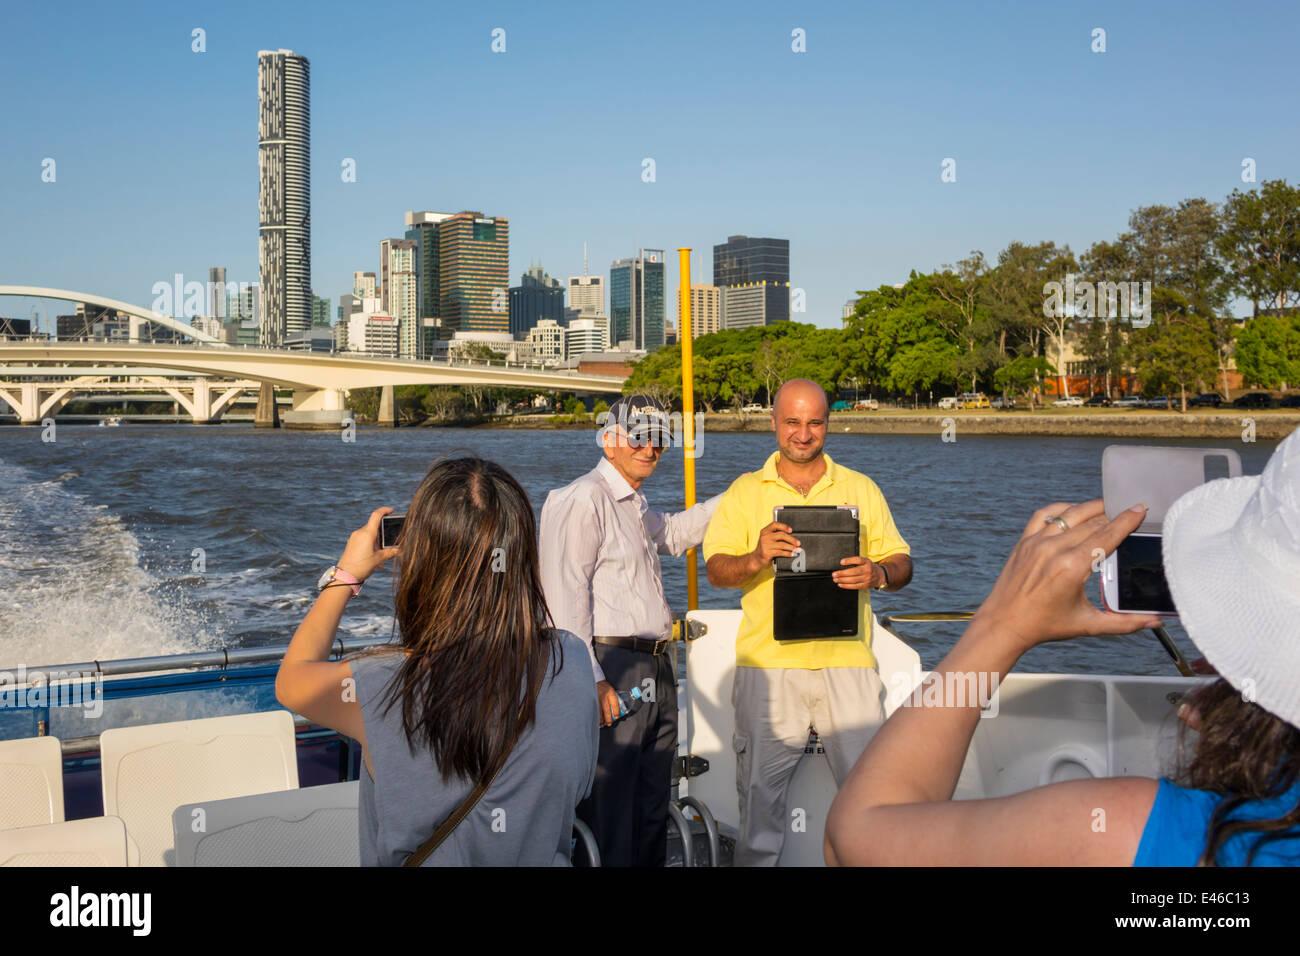 Brisbane Australia Queensland Central Business District CBD city skyline skyscrapers buildings CityCat ferry boat - Stock Image